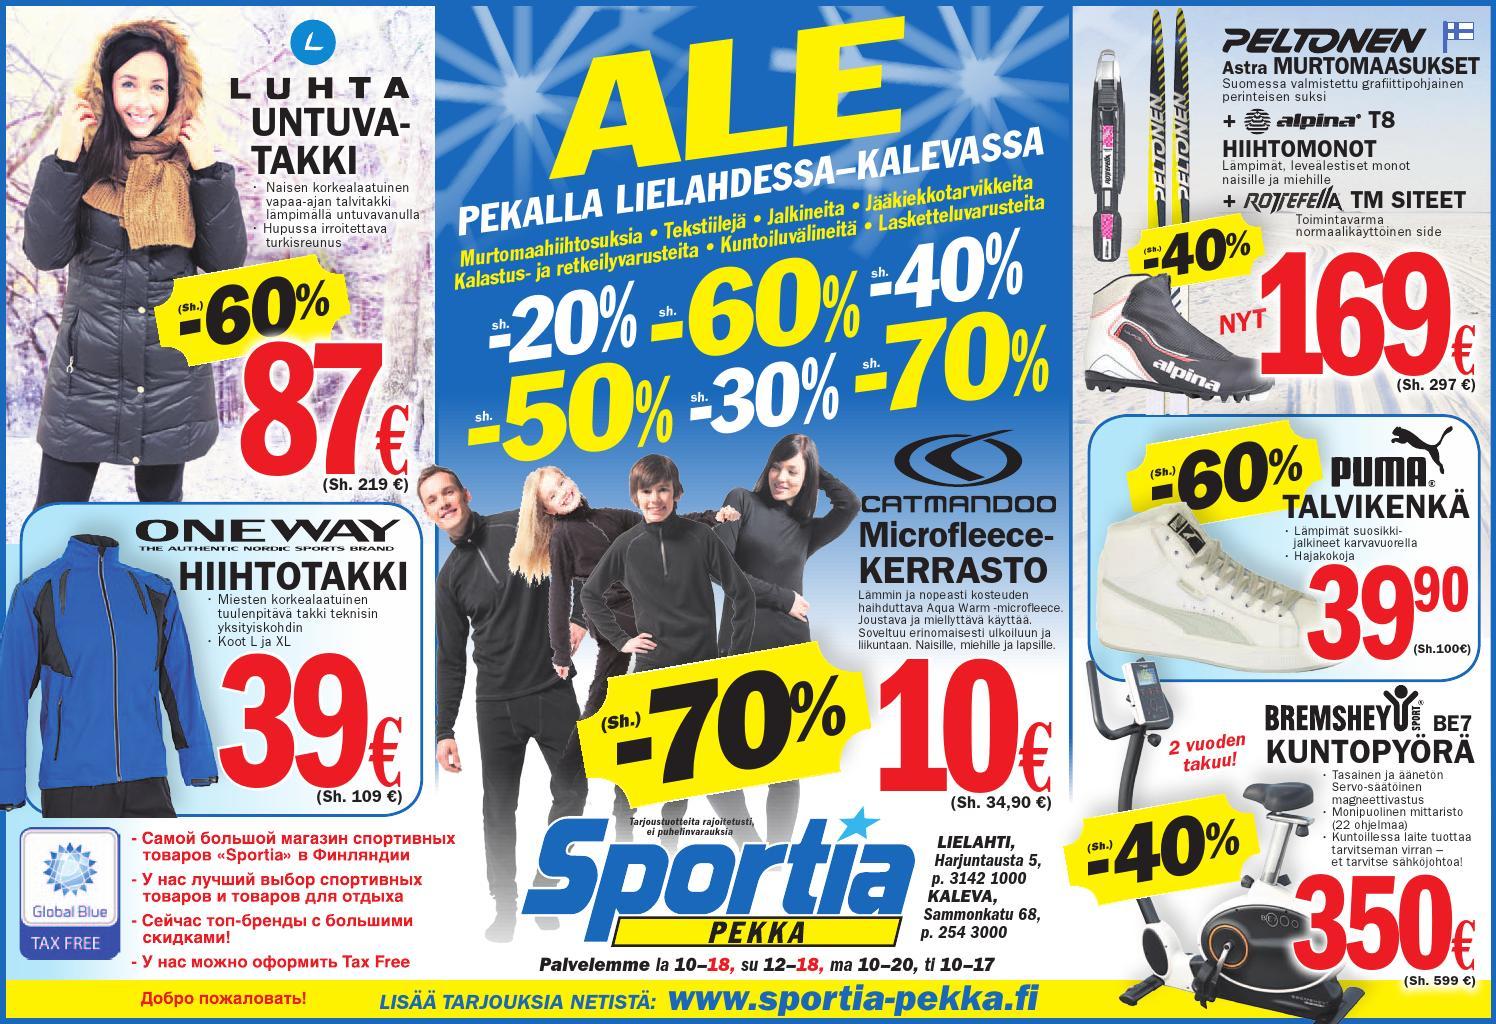 Sportia-Pekan viikonlopunmainos 27.12. - 29.12.2013 by Sportia-Pekka Sportia-Pekka - Issuu